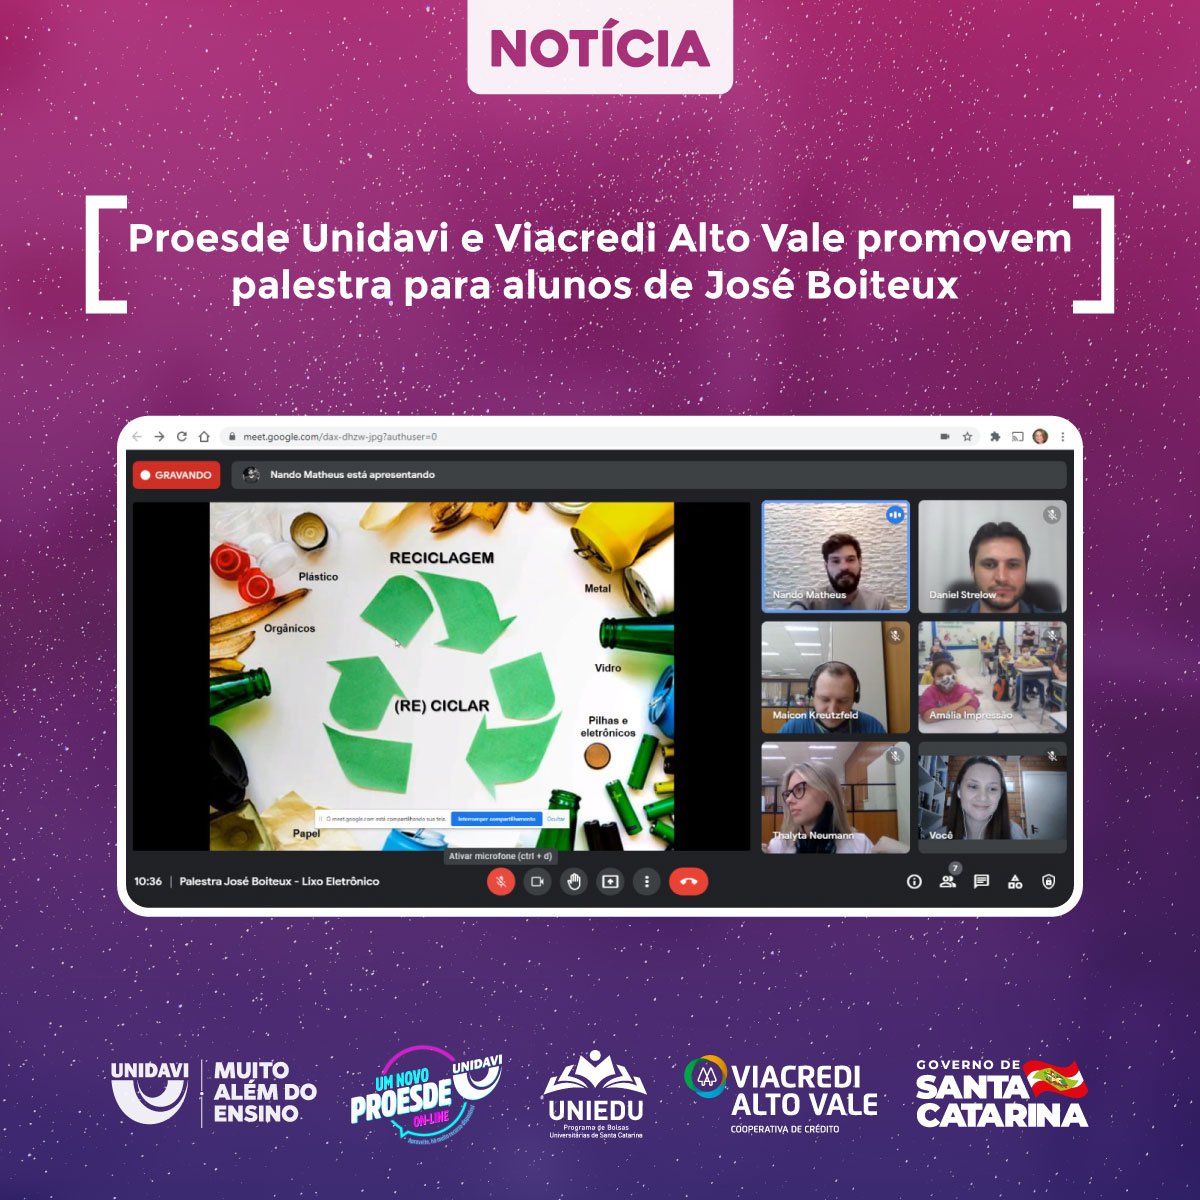 Proesde Unidavi e Viacredi Alto Vale promovem palestra para alunos de José Boiteux